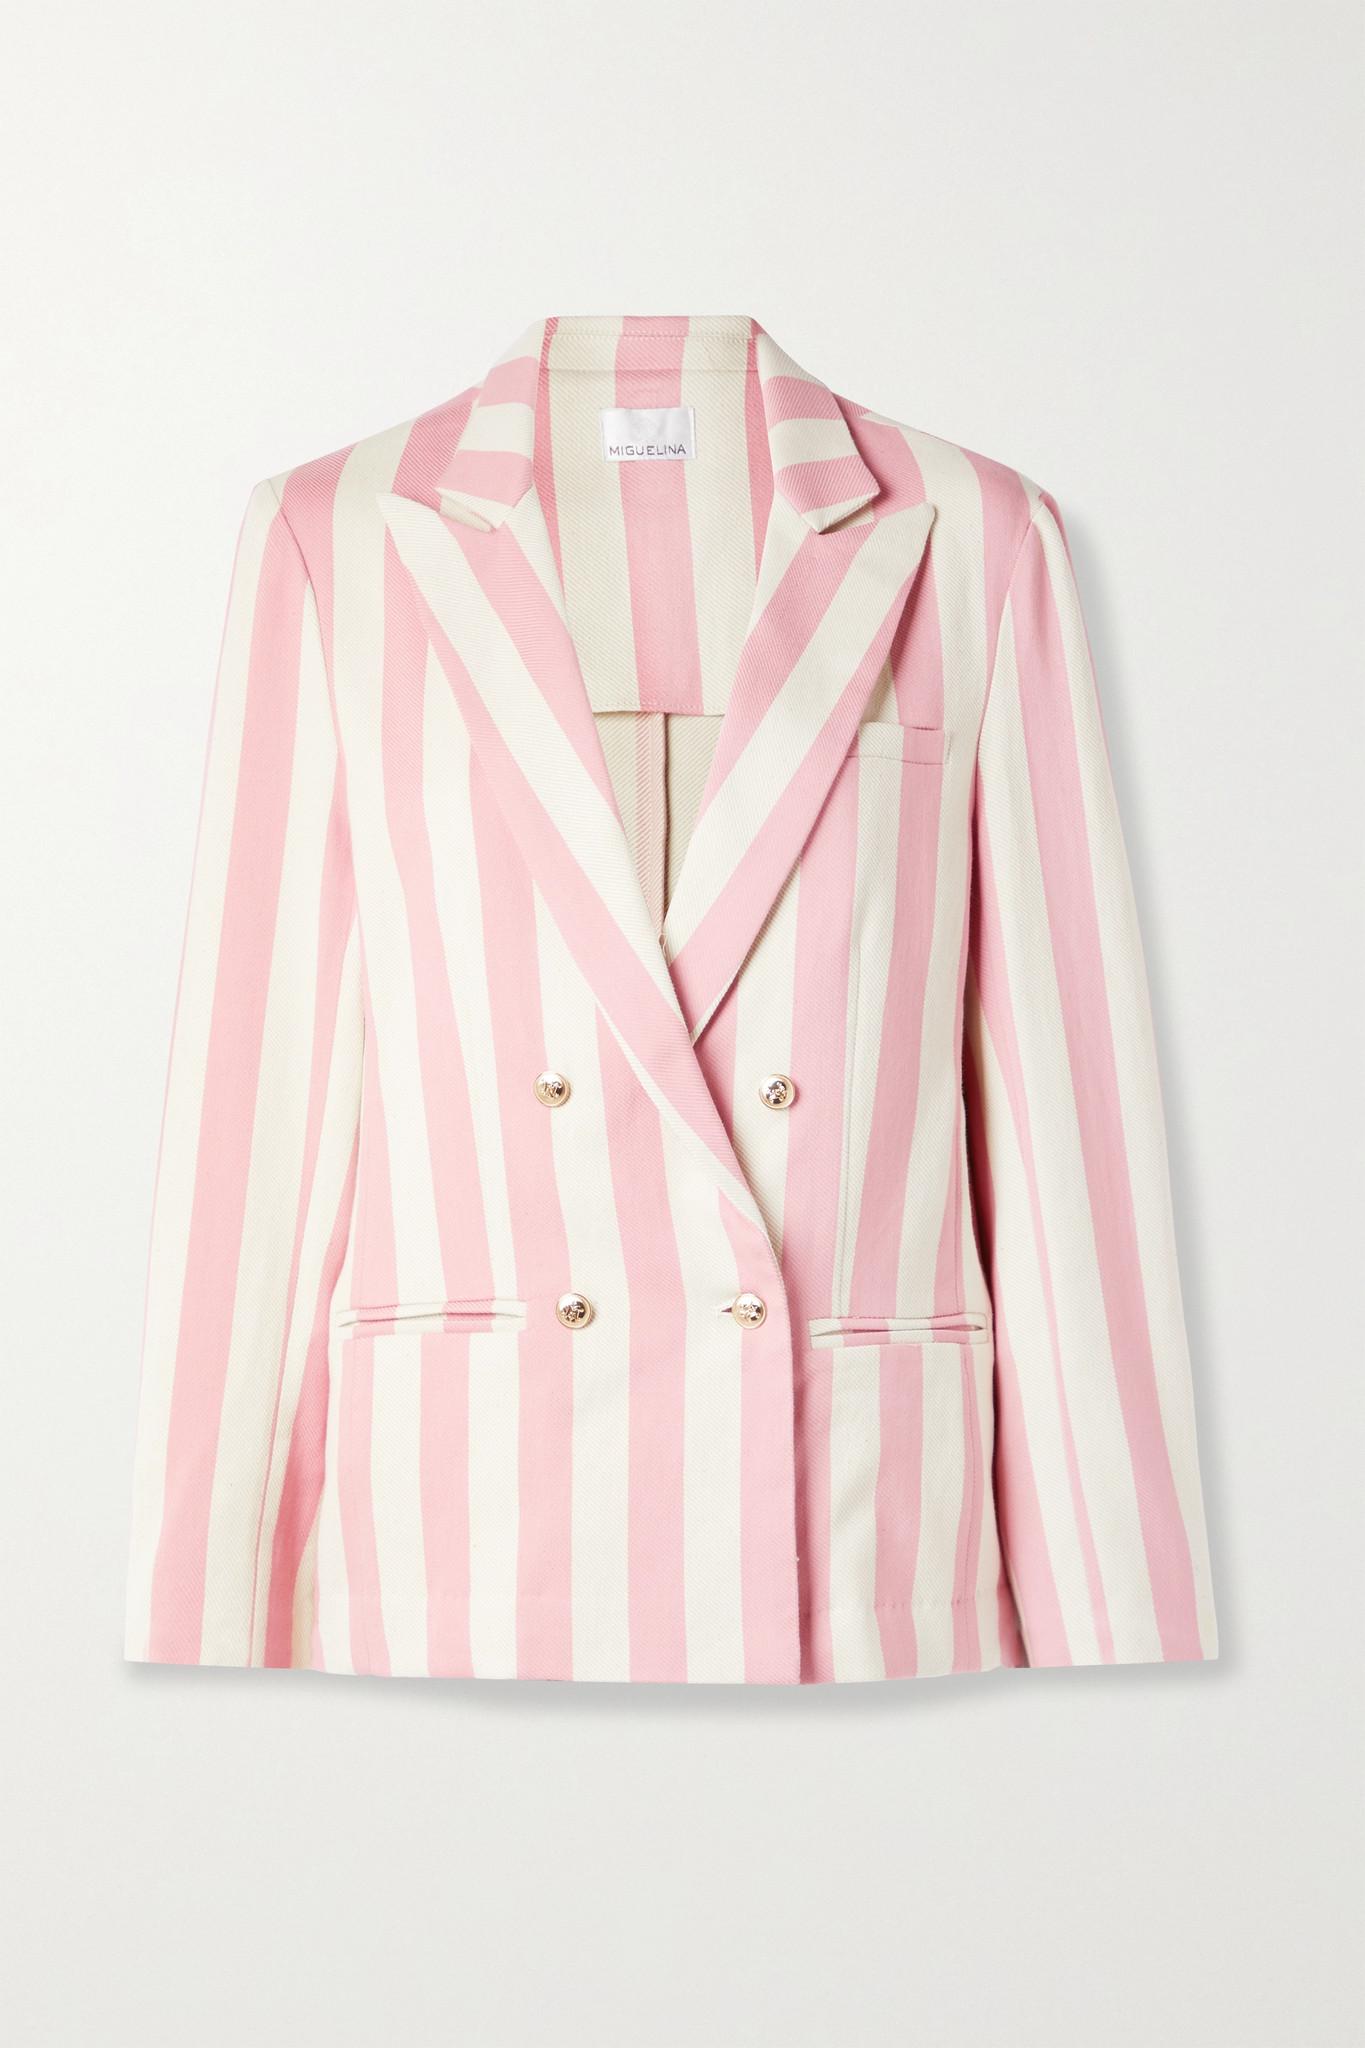 MIGUELINA - Chiara 双排扣条纹纯棉斜纹布西装外套 - 粉红色 - small